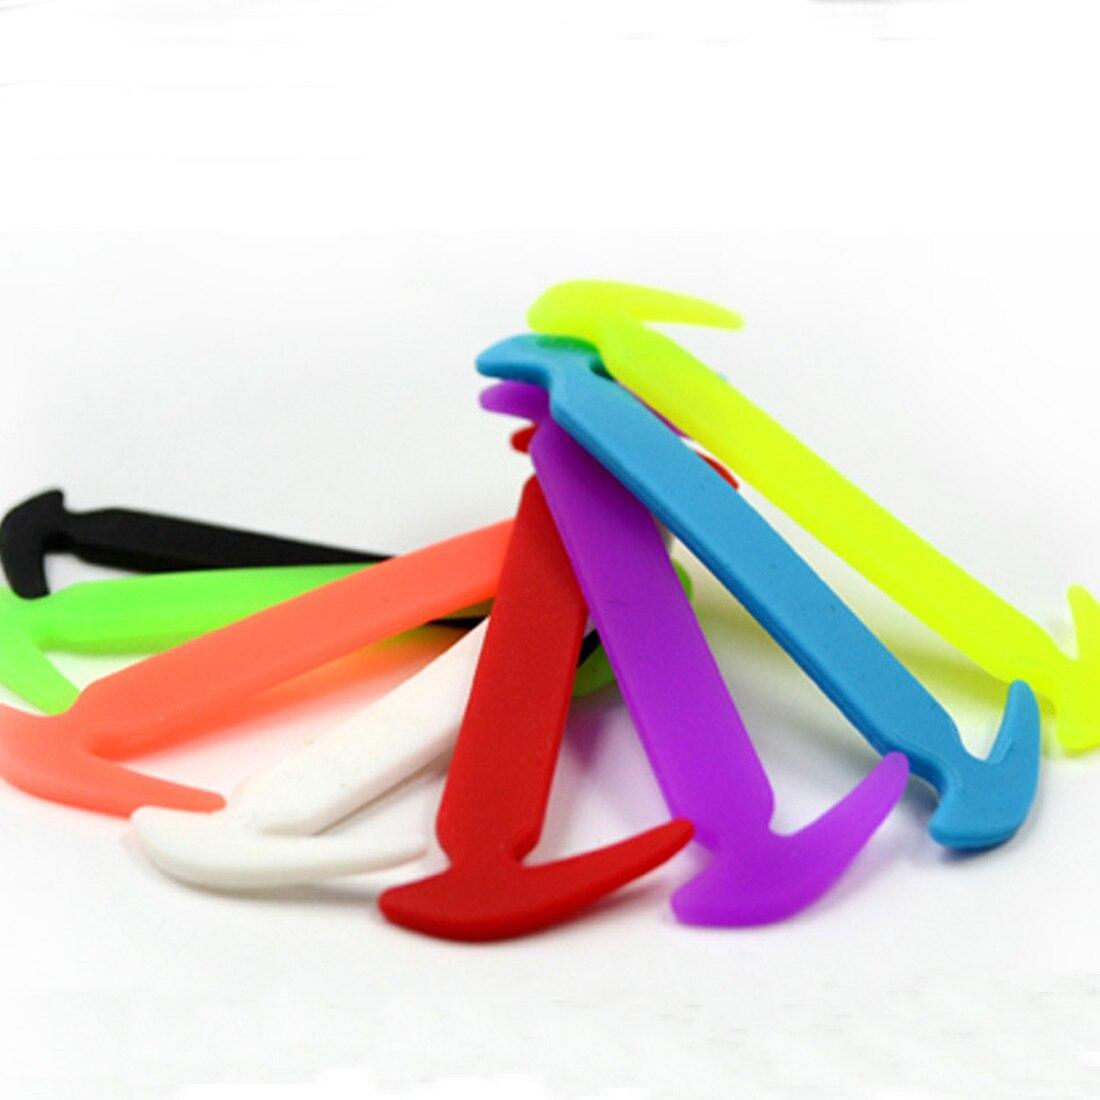 12Pcs Multicolor Easy No Tie Elastic Shoelaces 100% Silicone Trainers Shoe Laces Adult Kids Children Sport Outdoor Shoe Strings